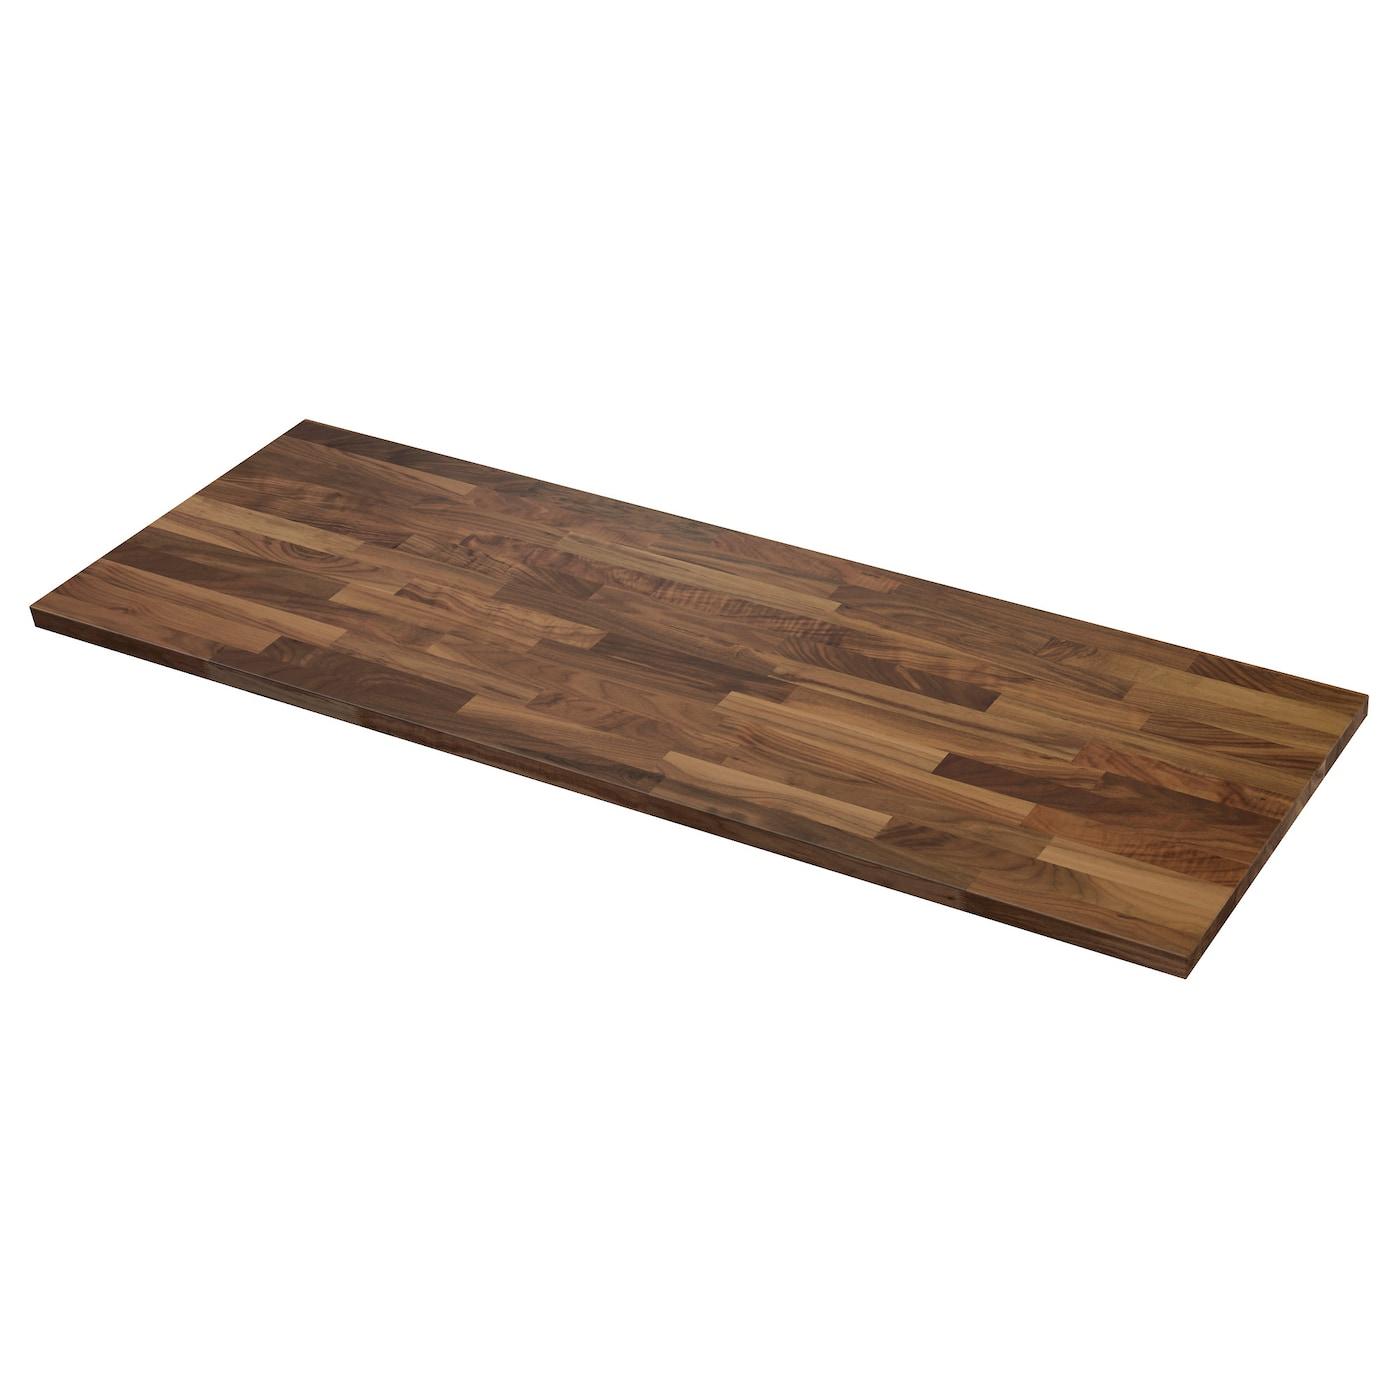 karlby plan de travail noyer 186x3 8 cm ikea. Black Bedroom Furniture Sets. Home Design Ideas